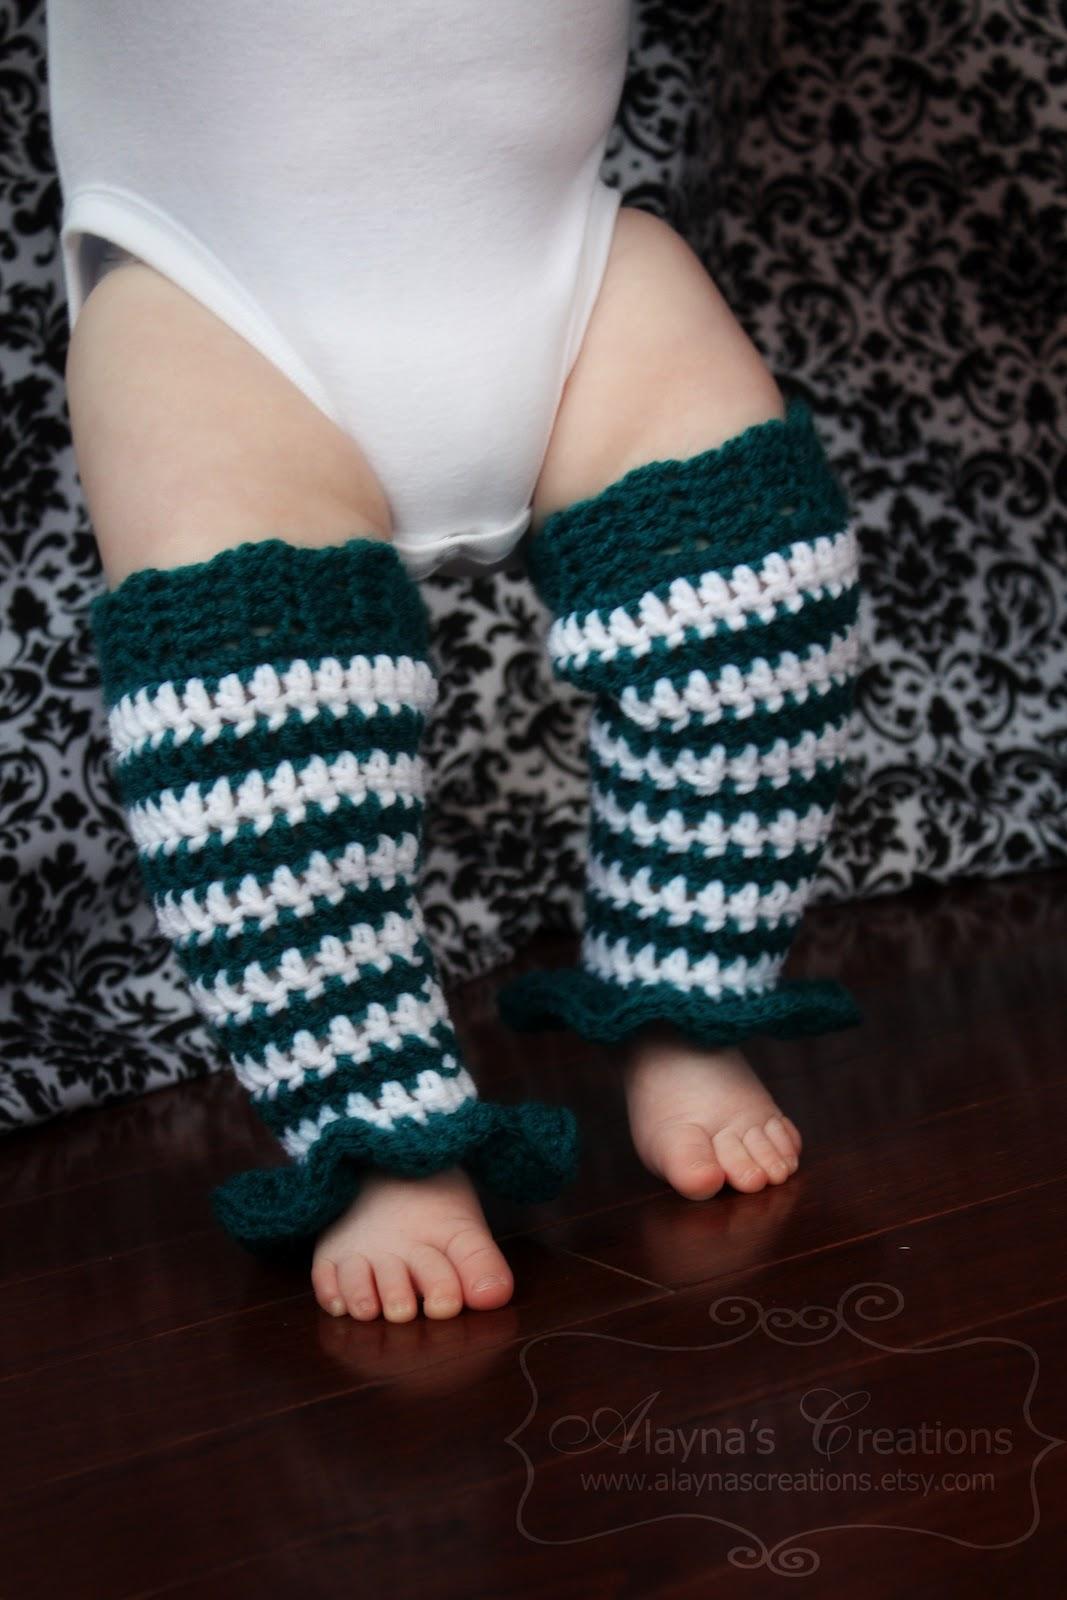 Crochet Baby Leg Warmers Pattern Free : Alaynas Creations: My First Crochet Pattern! Ruffled Baby ...